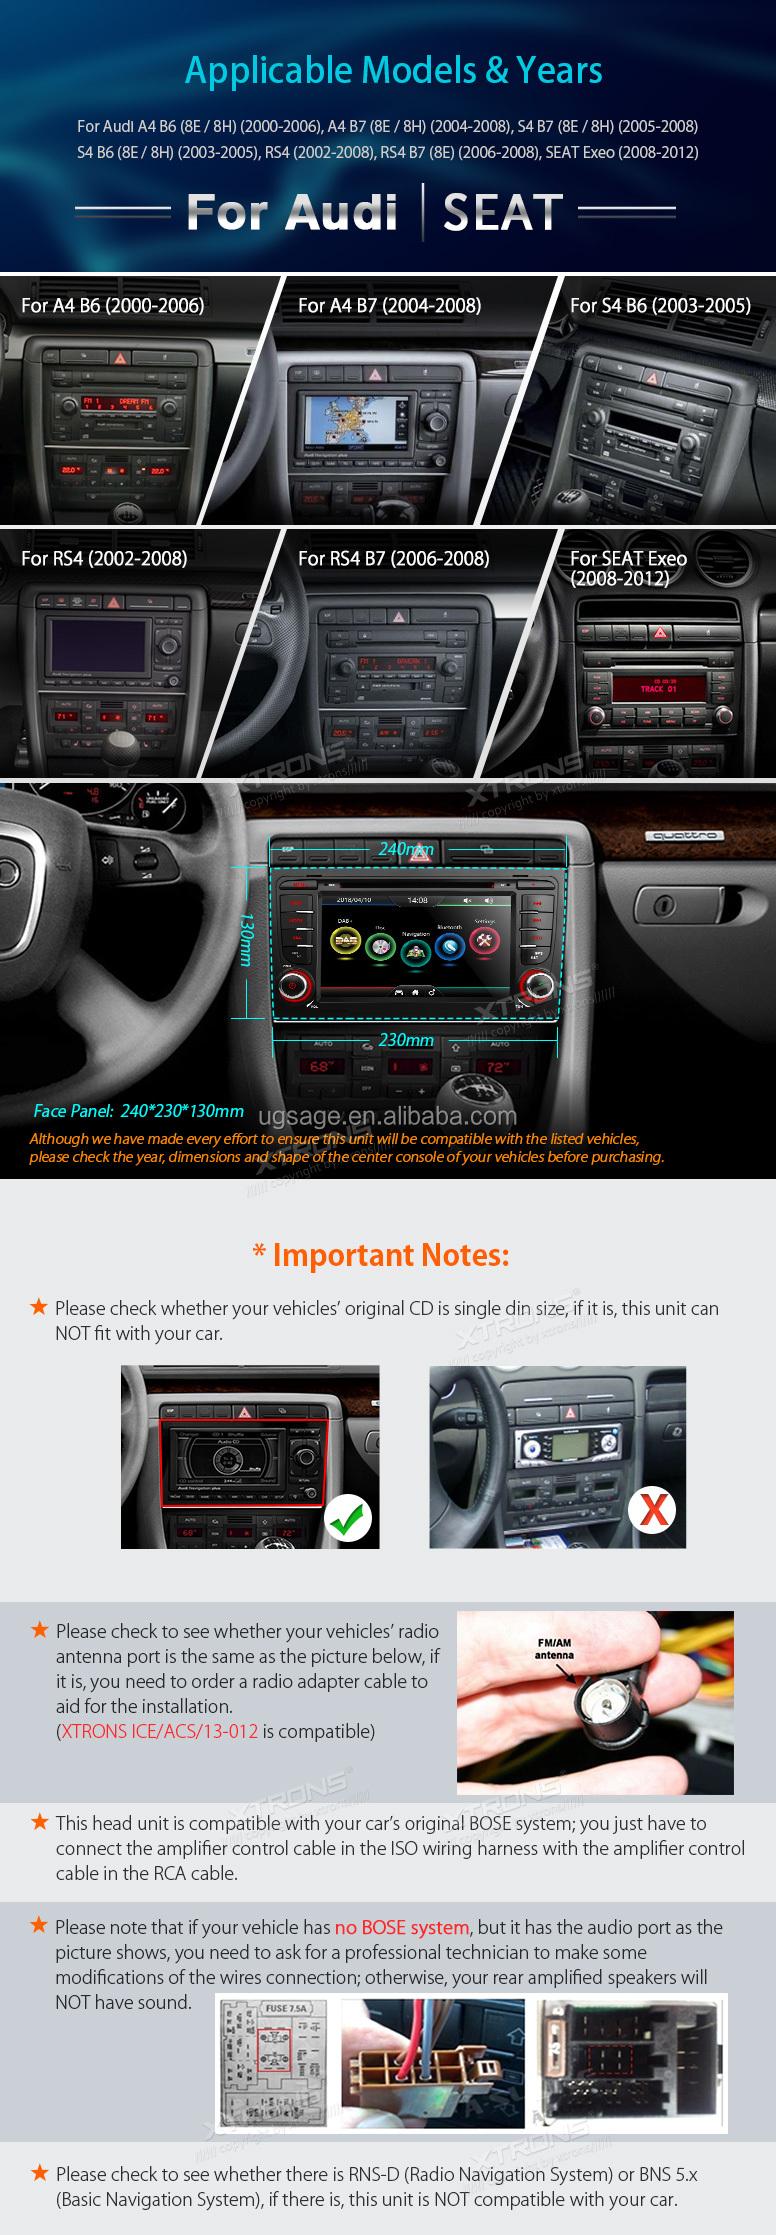 Xtrons Windows Ce 6 0 Steering Wheel Control Car Mp3/mp4 Radio Dvd Player  Gps Navigation For Audi A4 B6/b7 - Buy Car Dvd,Radio 2 Din,Multimedia Car